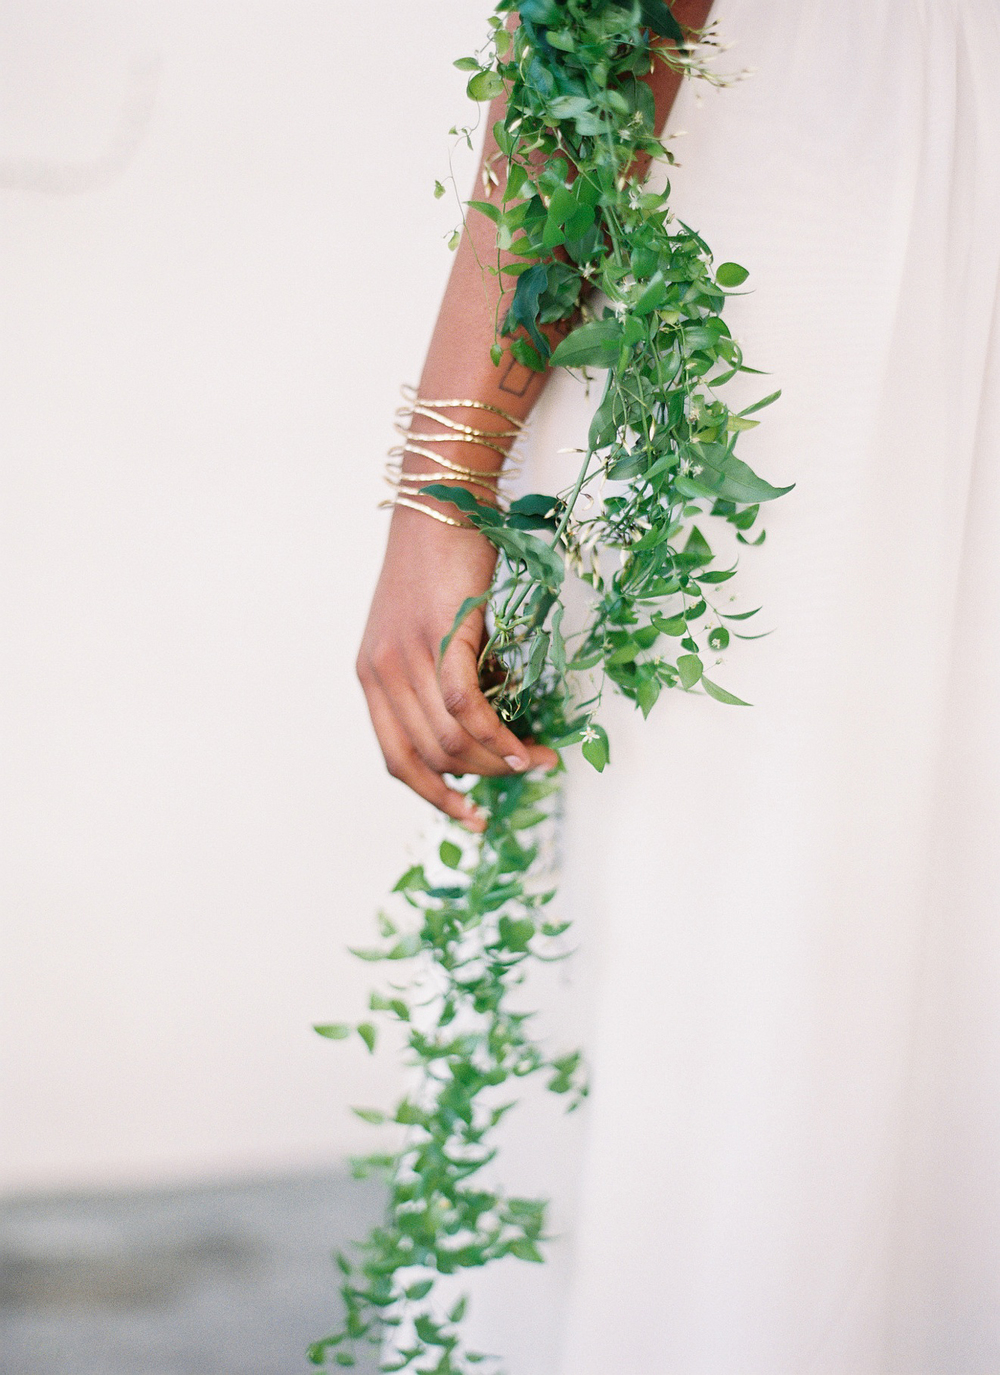 Floralessence-Esmeraldafranco-46.JPG